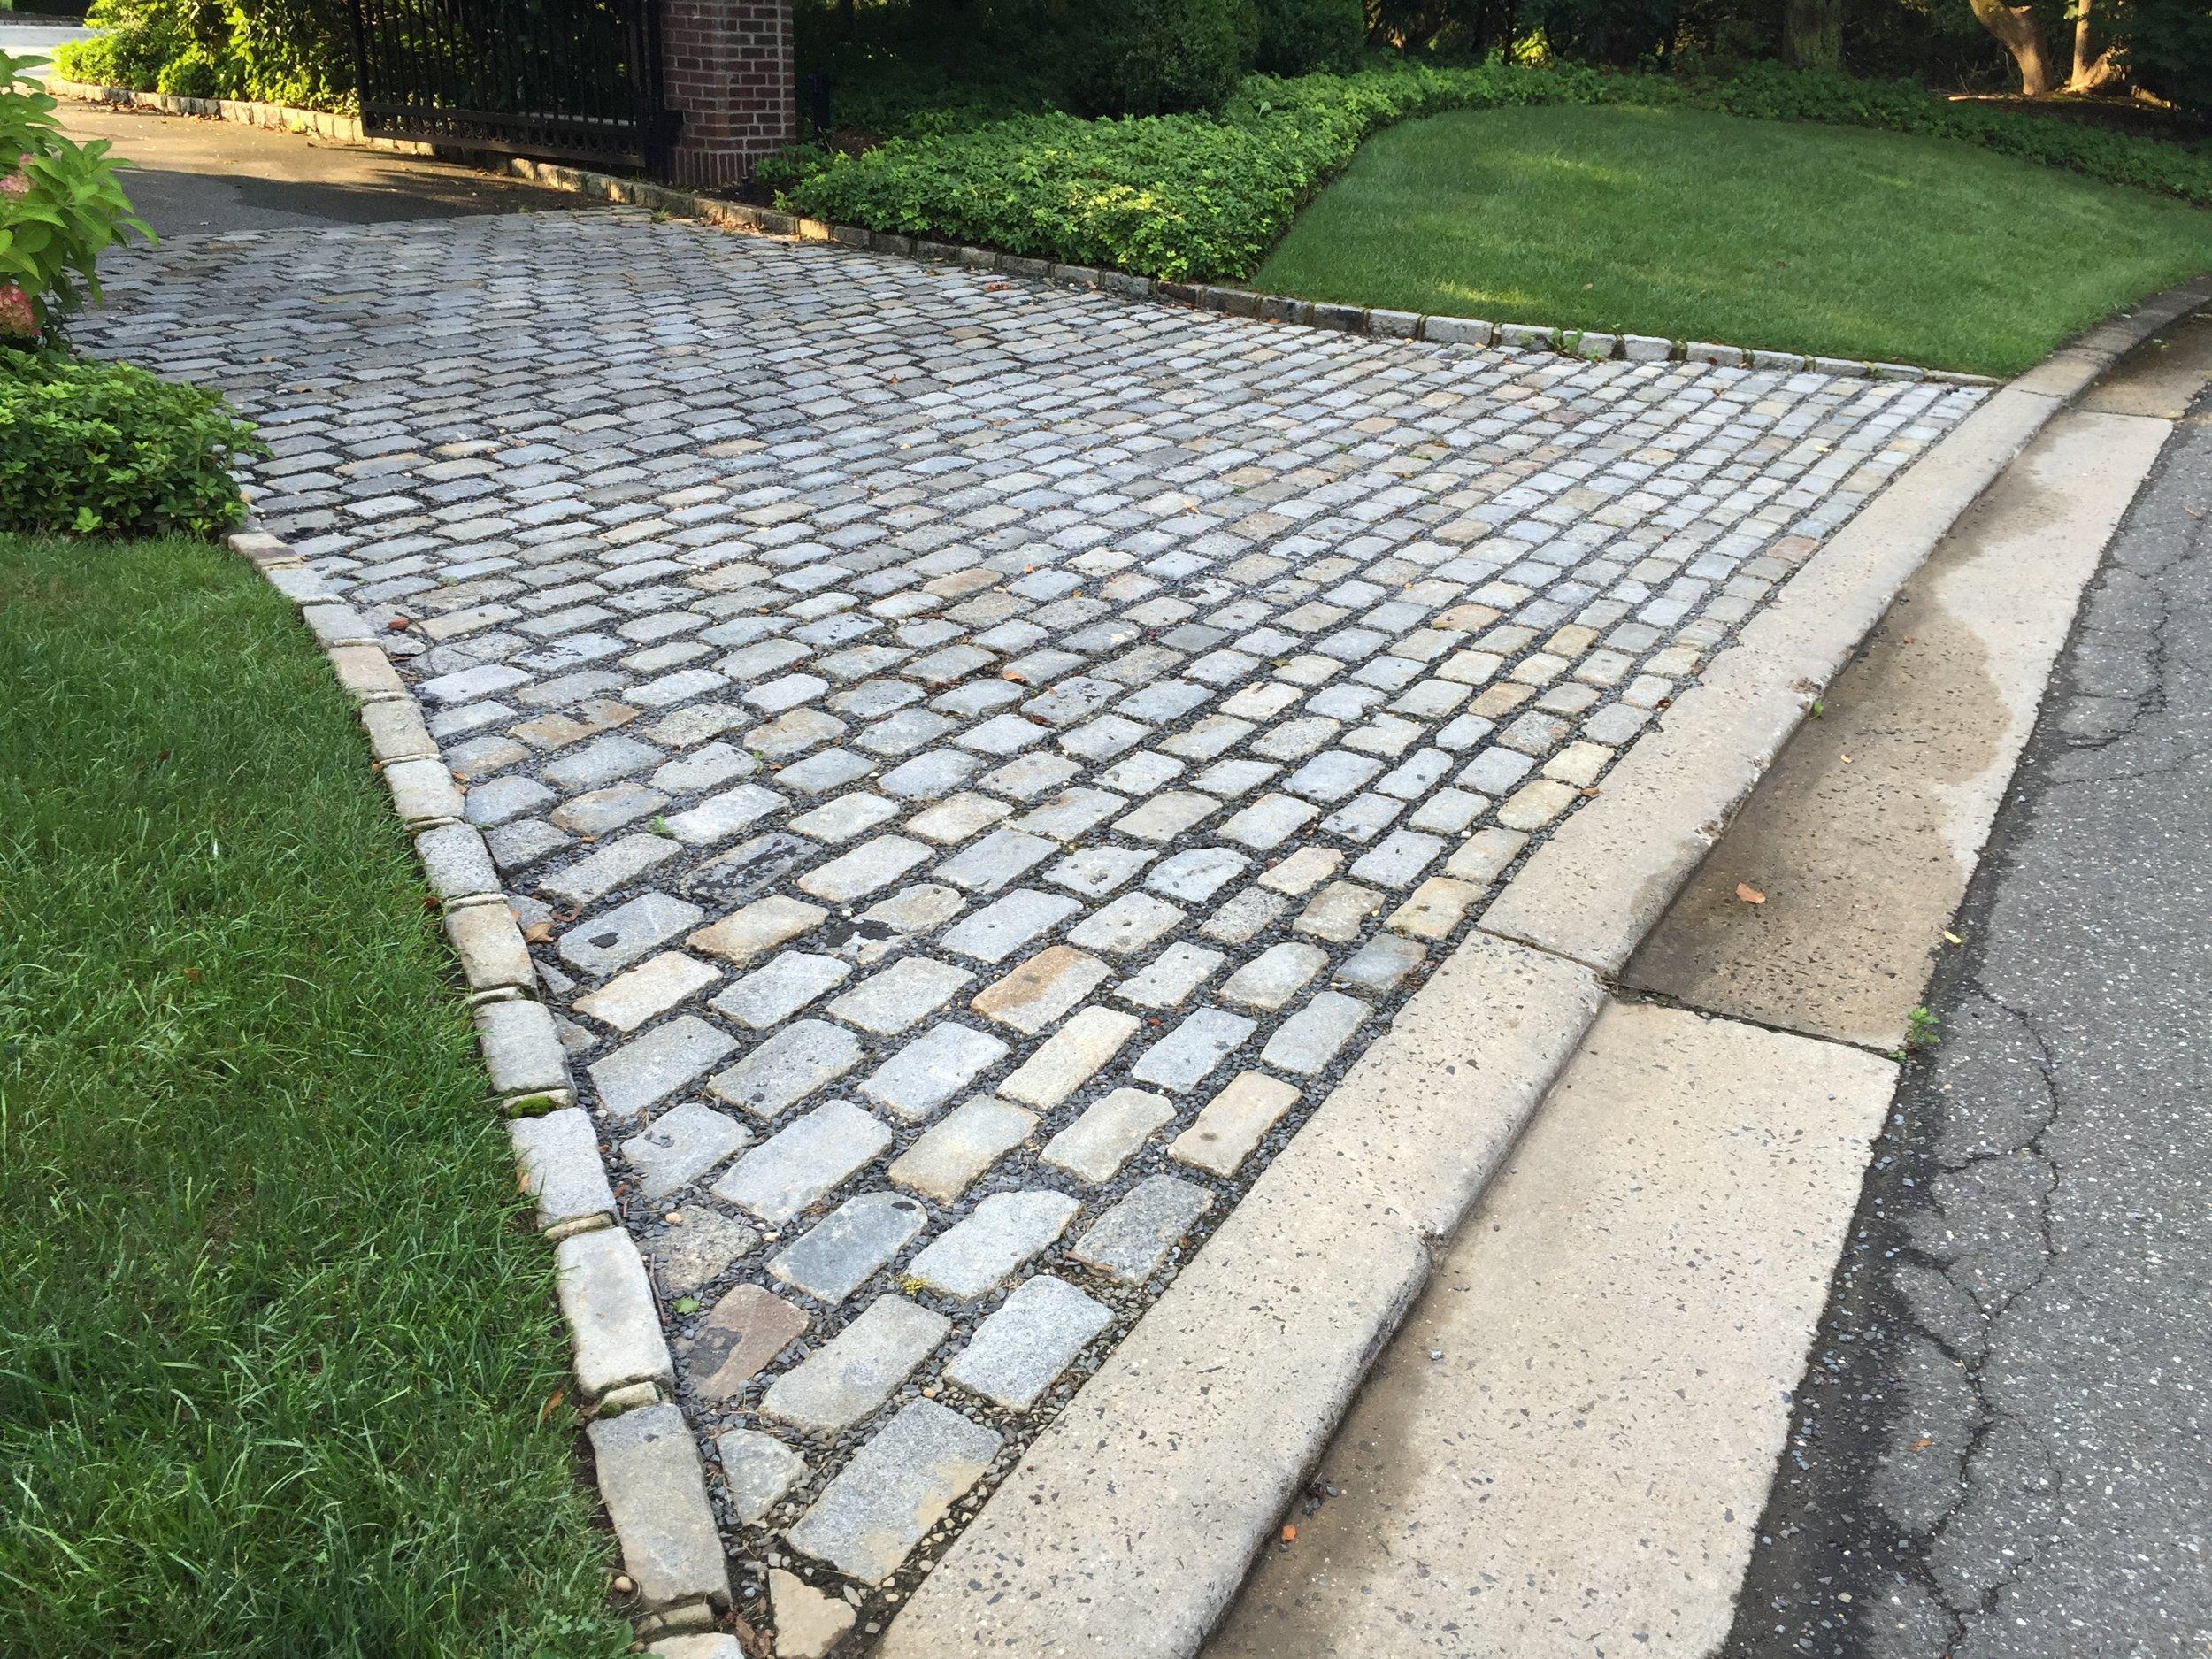 Professional walkway paver company in Long Island, NY